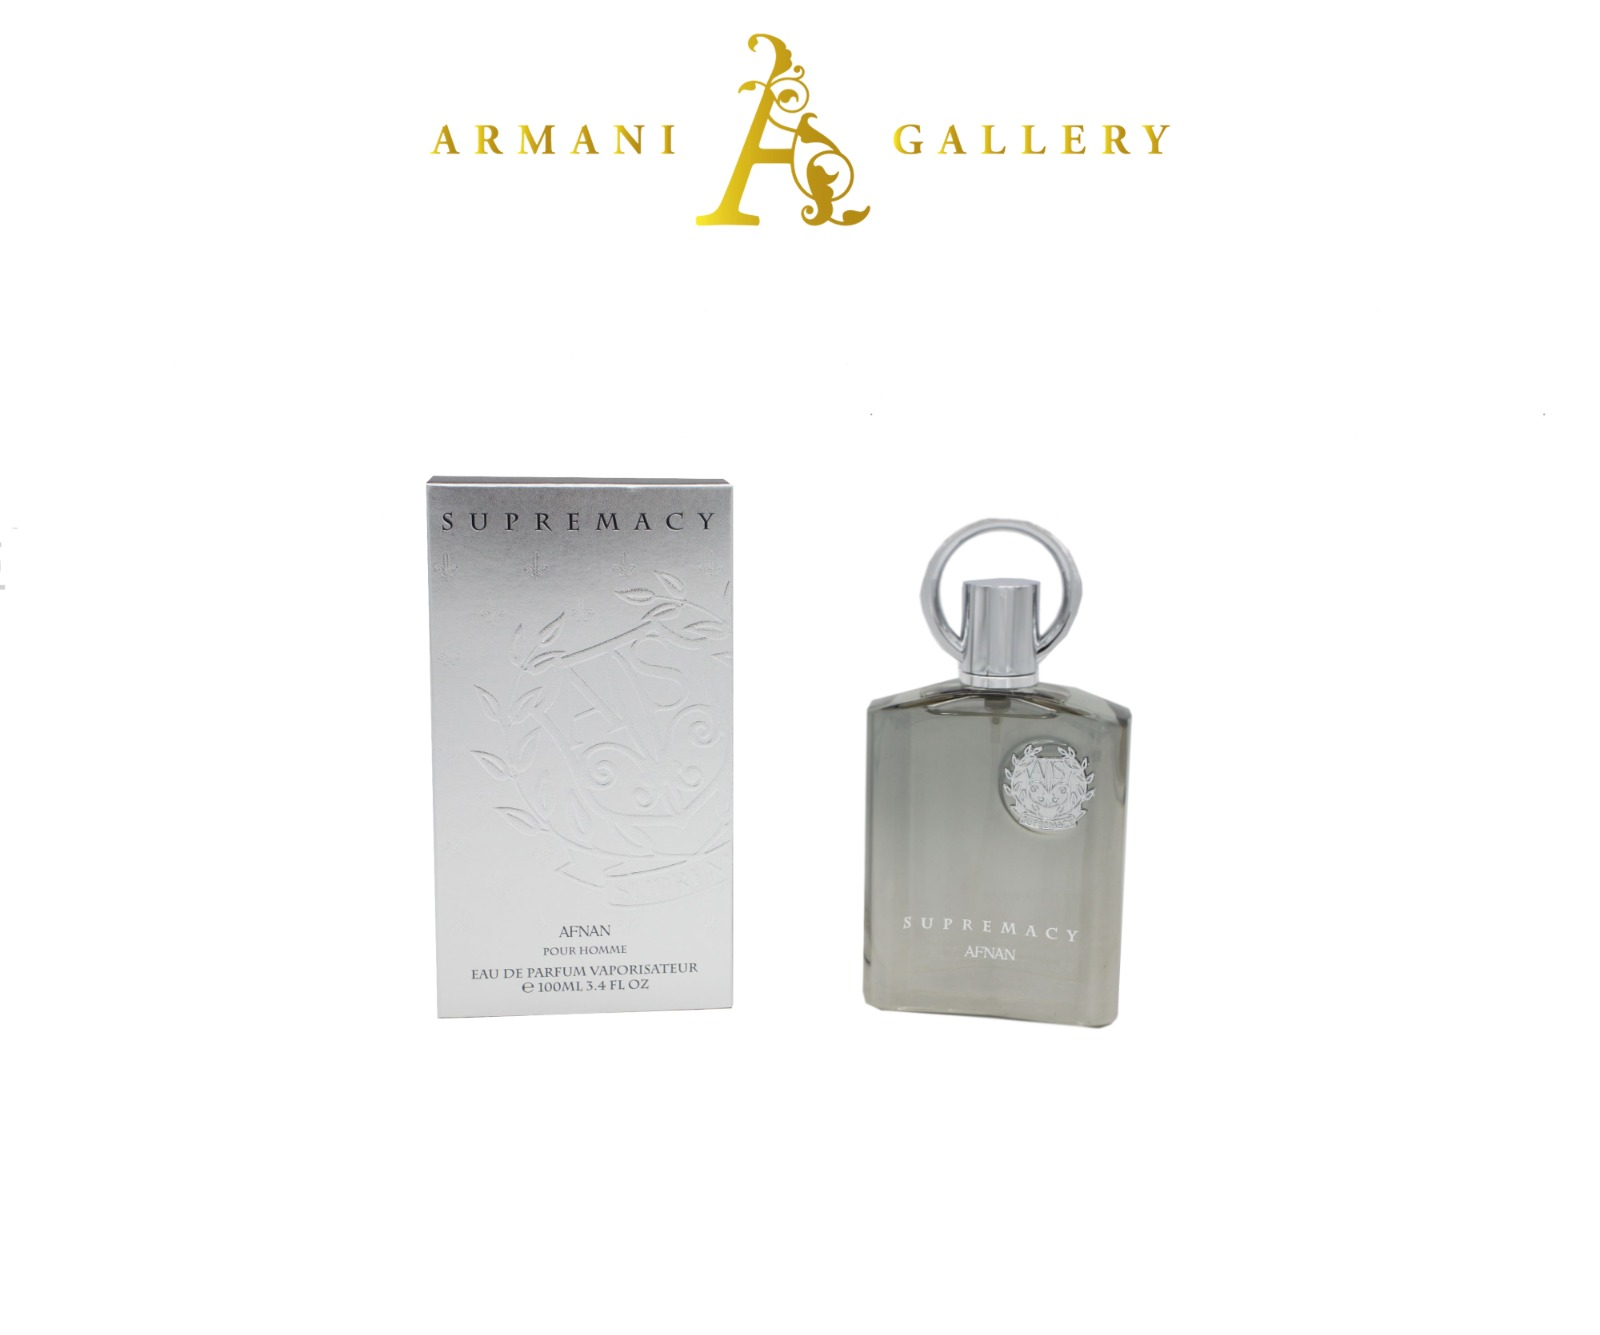 Buy Stunning Afan Perfume Supremacy Silver Cologne Men Eau De Perfurm Bottle 100ml